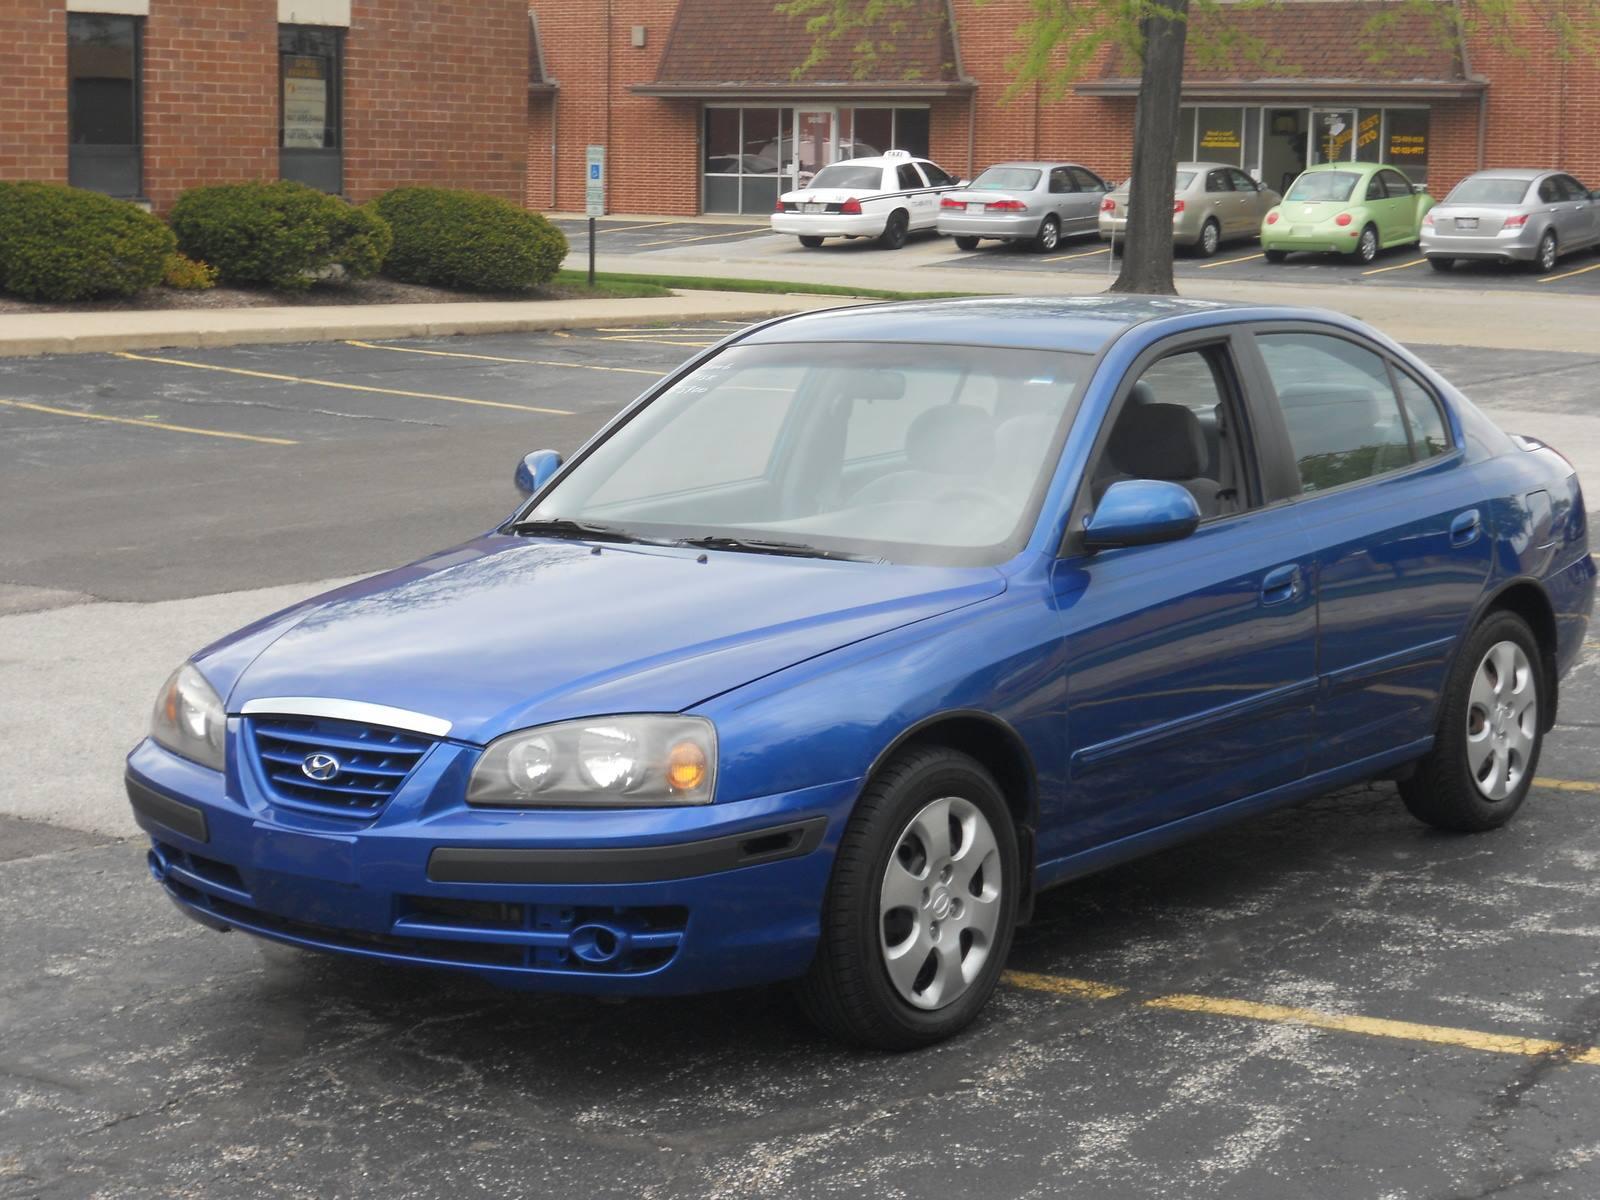 Blue car police search